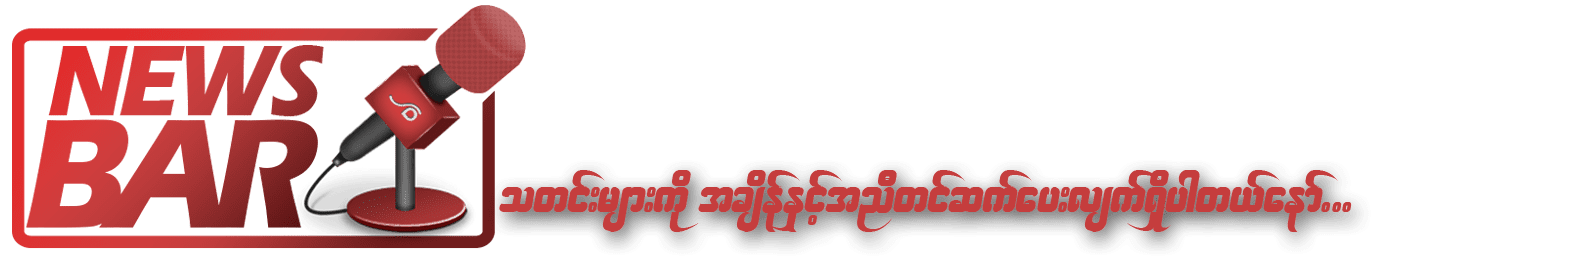 Asia News Bar